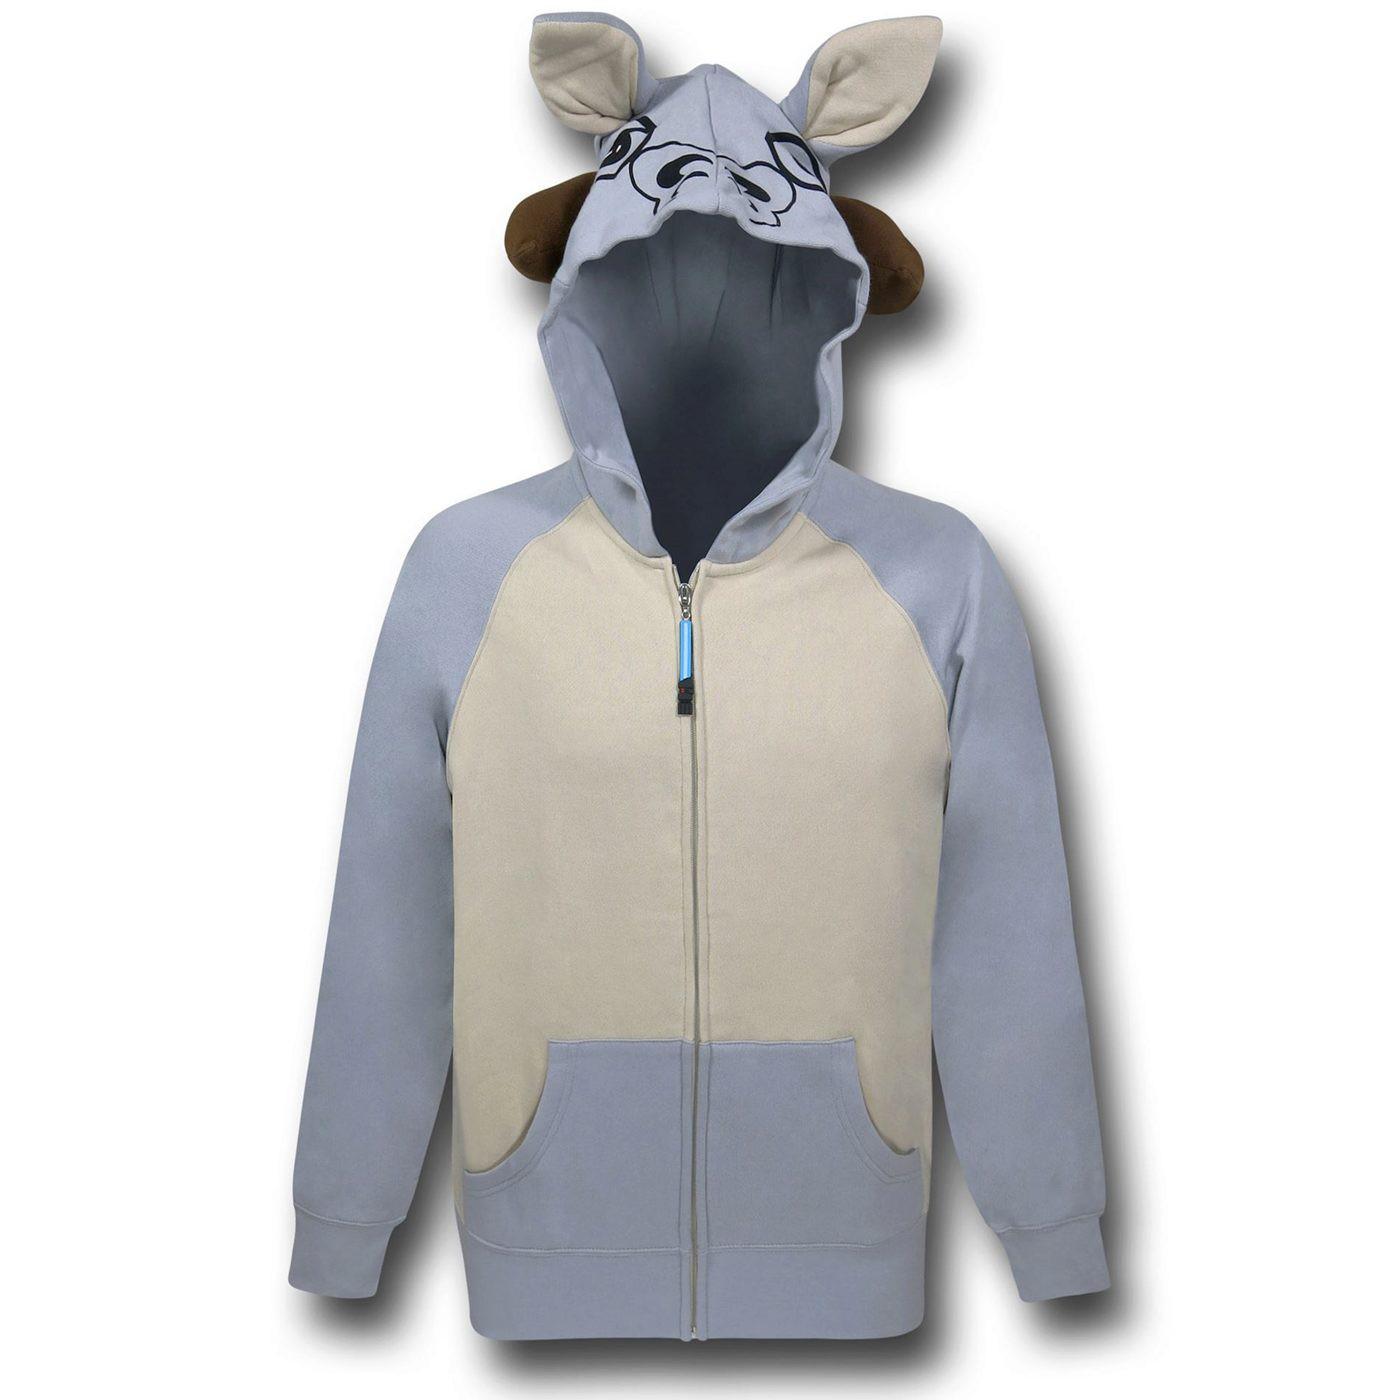 Star Wars Tauntaun Costume Hoodie